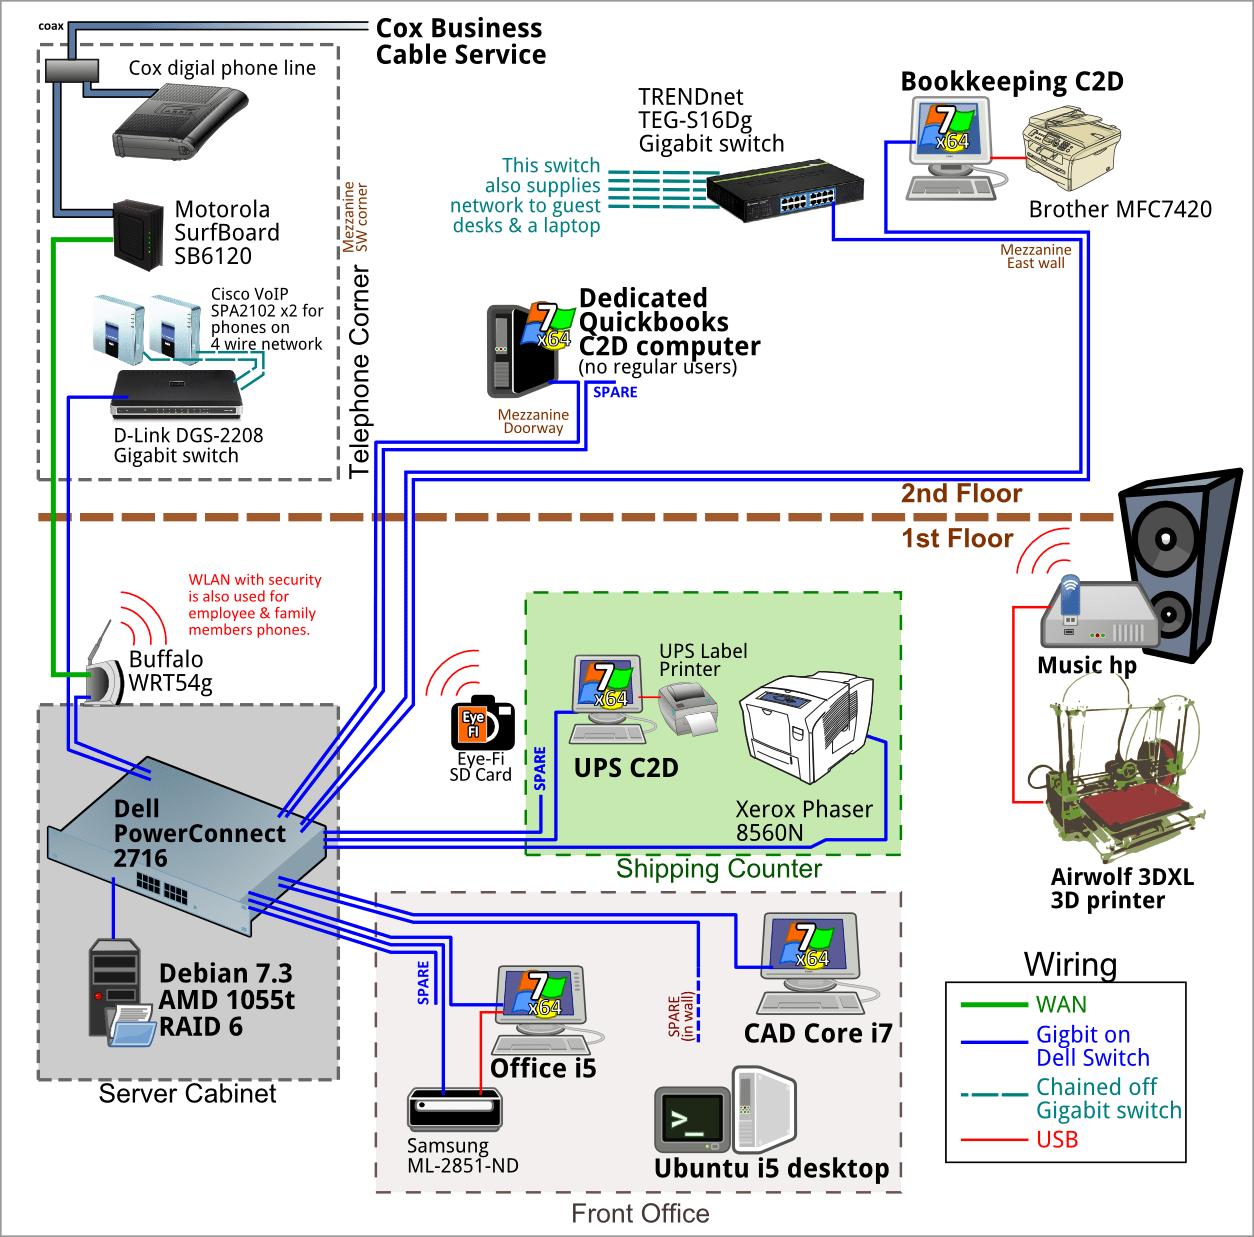 hybrid network topology diagram lx torana tacho wiring free engine image for